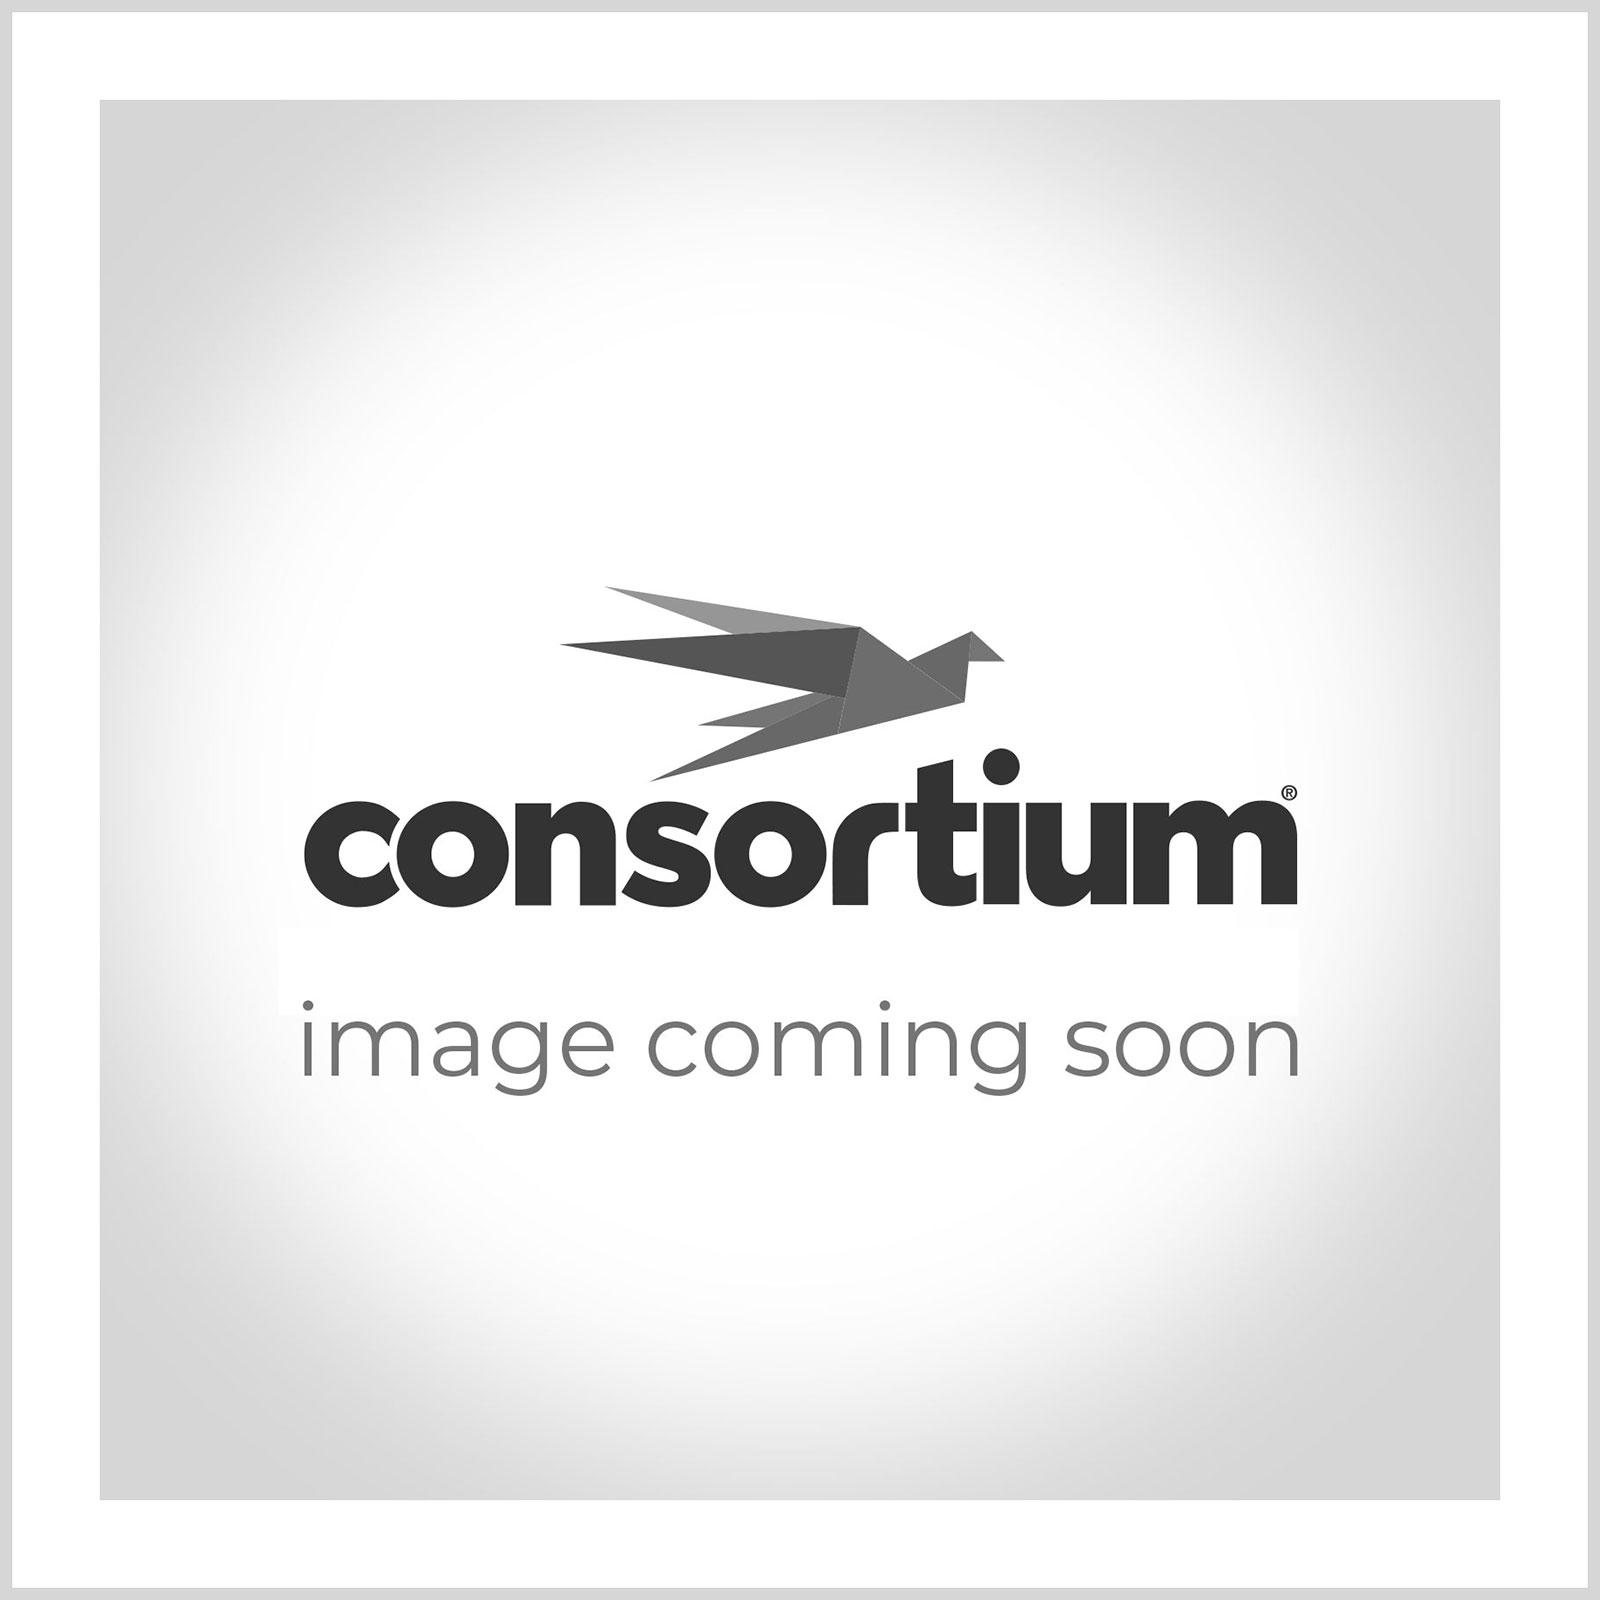 Reversible Desk Map of the UK & Europe